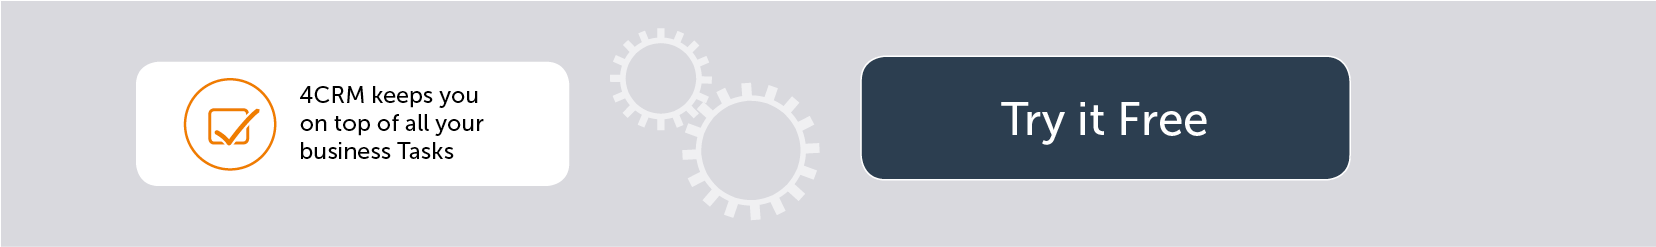 4CRM_Task_Footer_Banner4